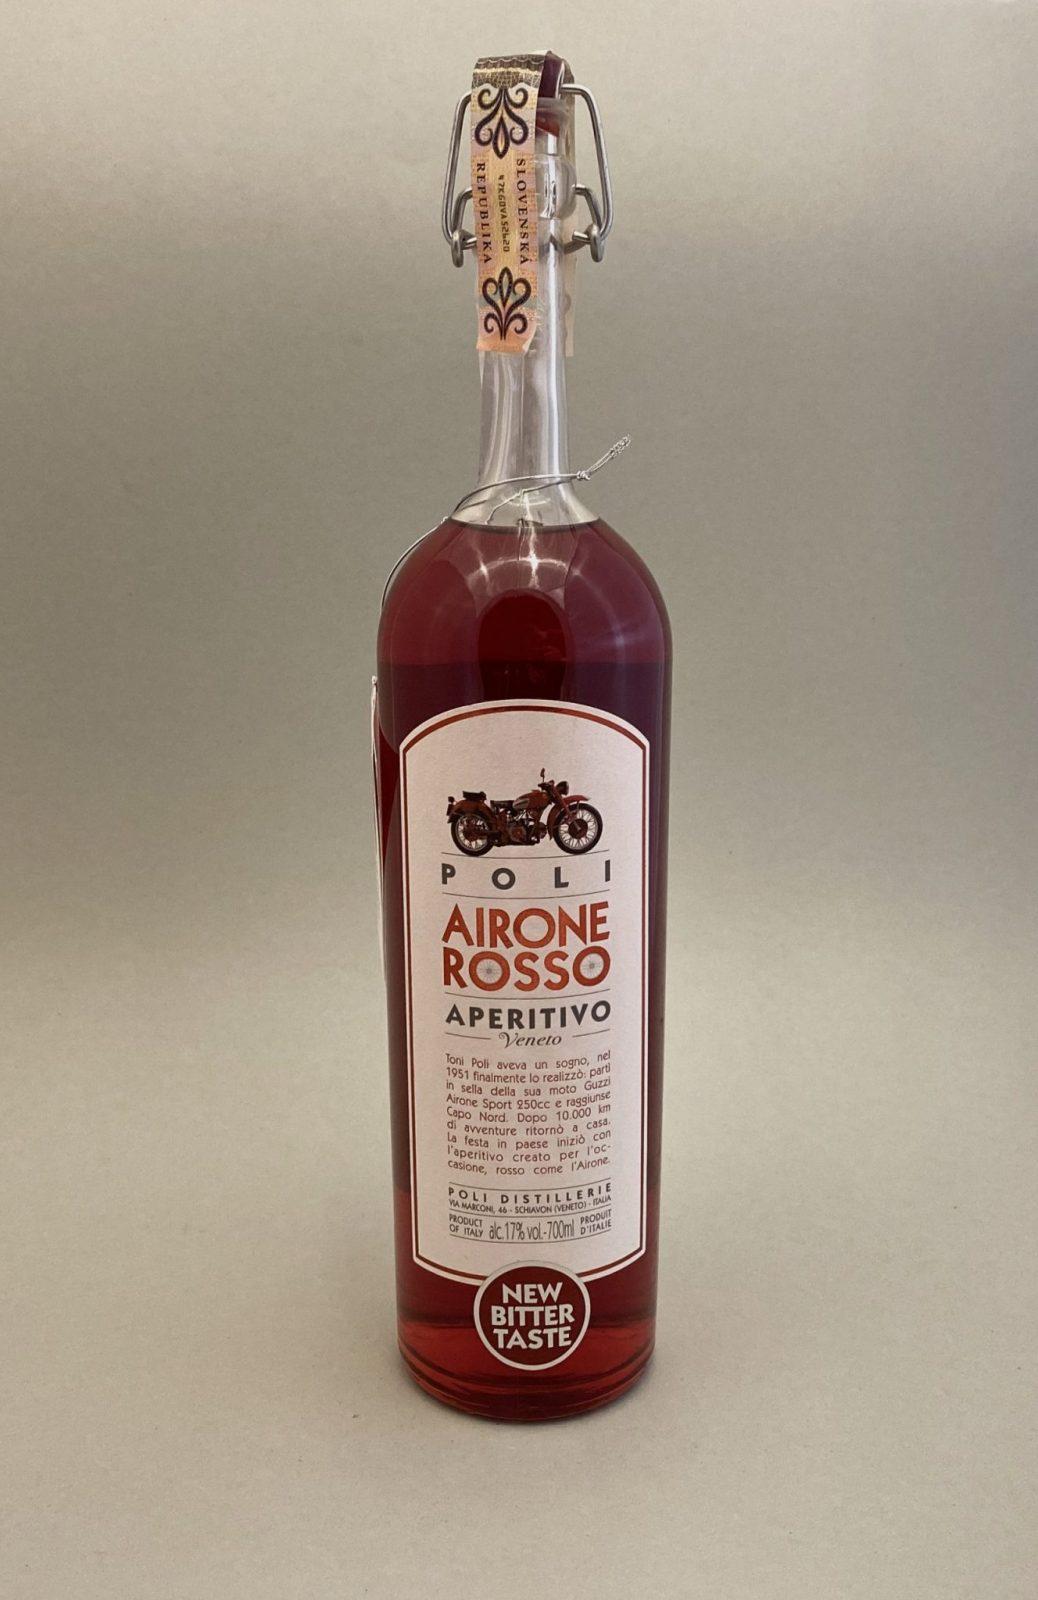 Airone Rosso 17%, Bottleshop Sunny wines slnecnice mesto, petrzalka, likér, rozvoz alkoholu, eshop